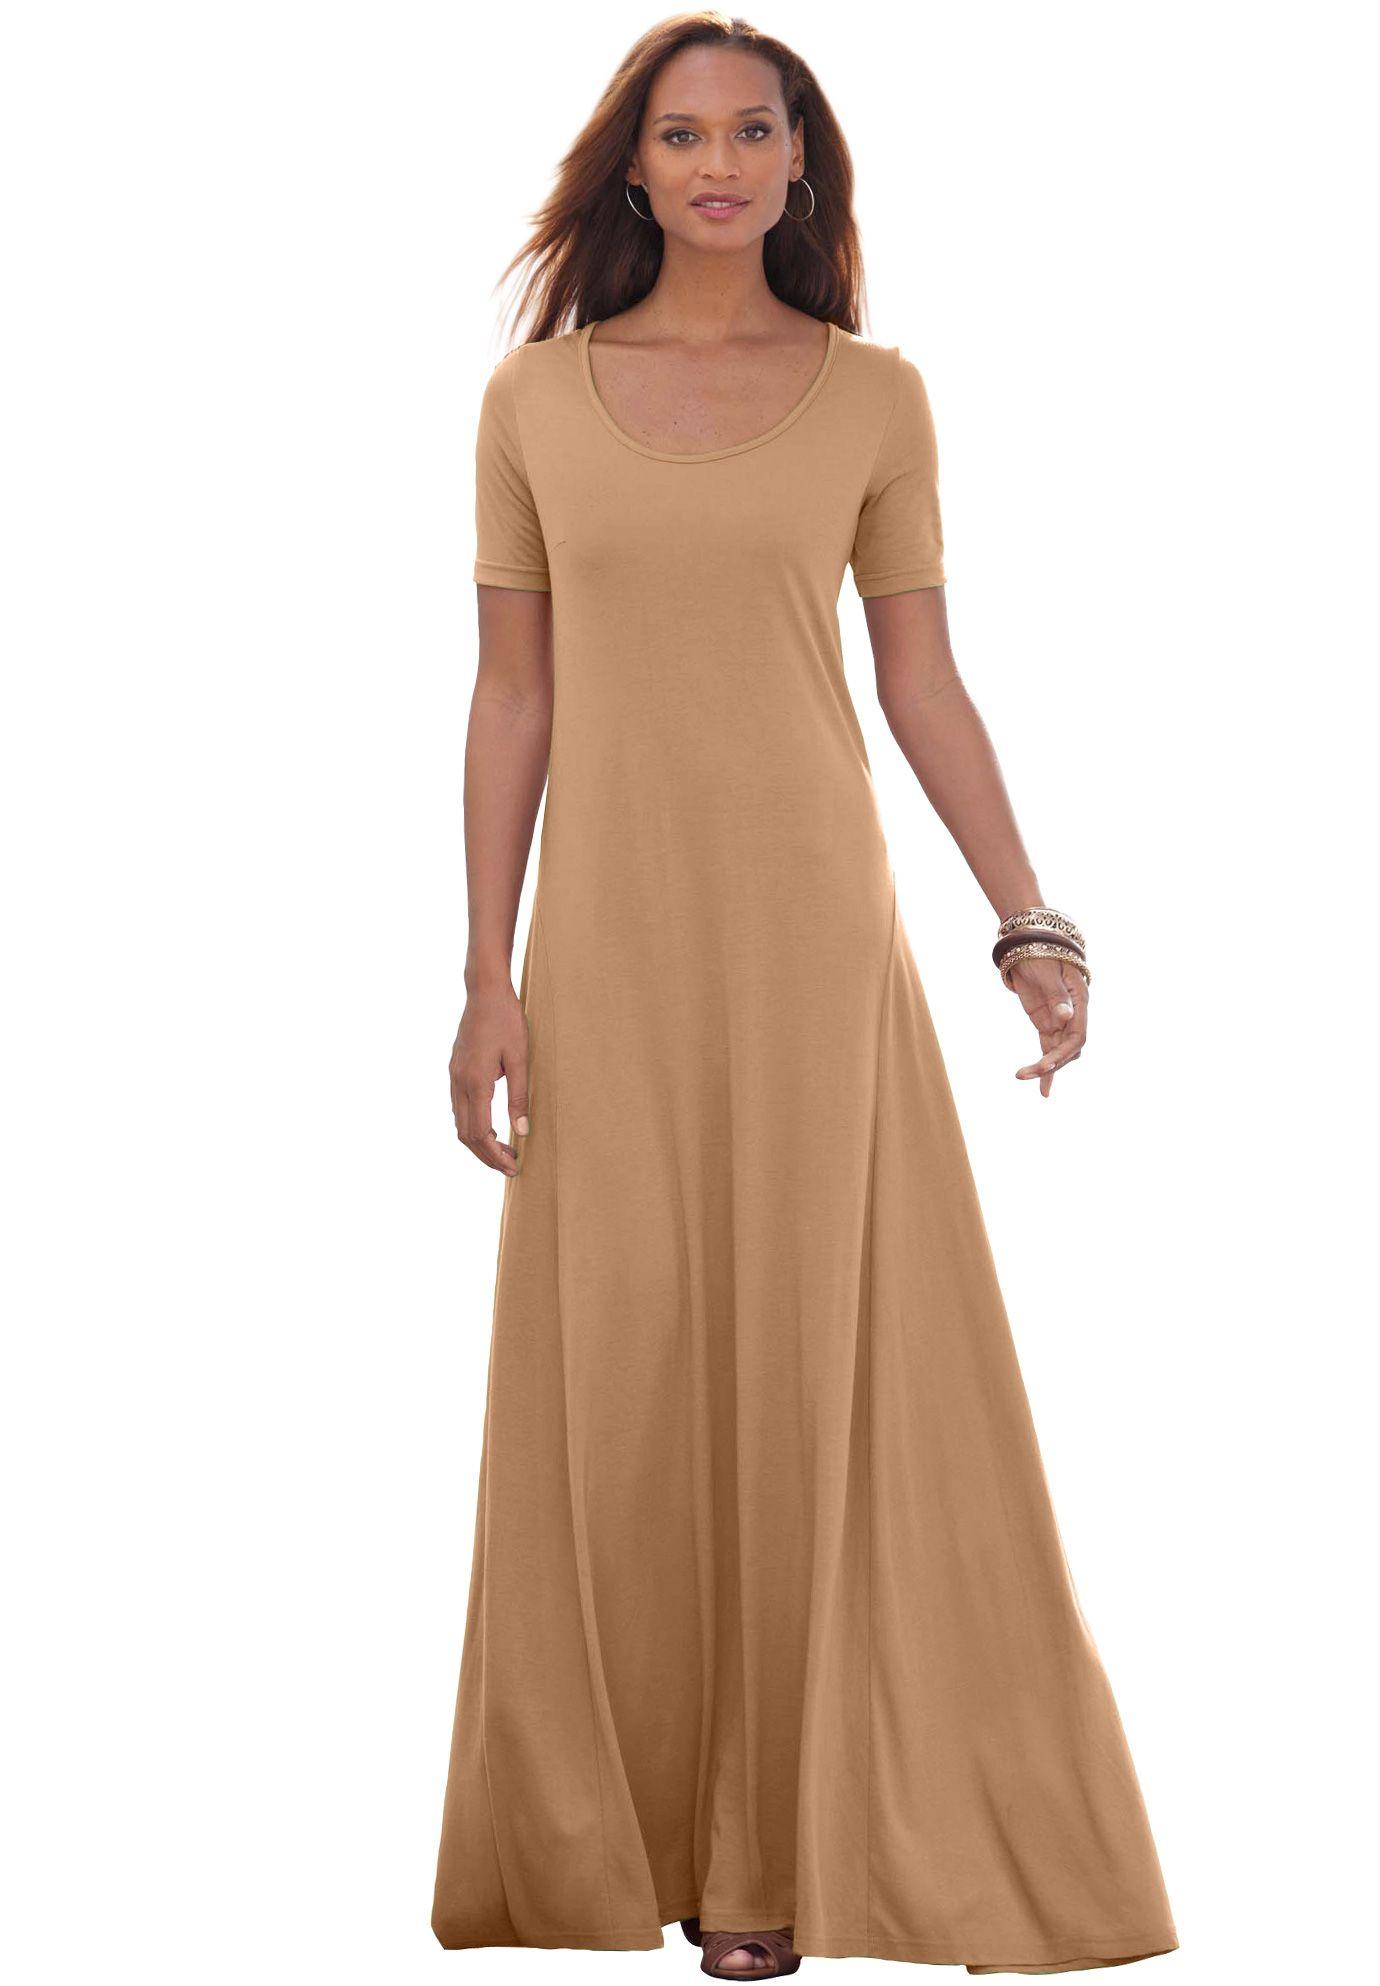 This elegant petite plus size maxi dress gives you an ...